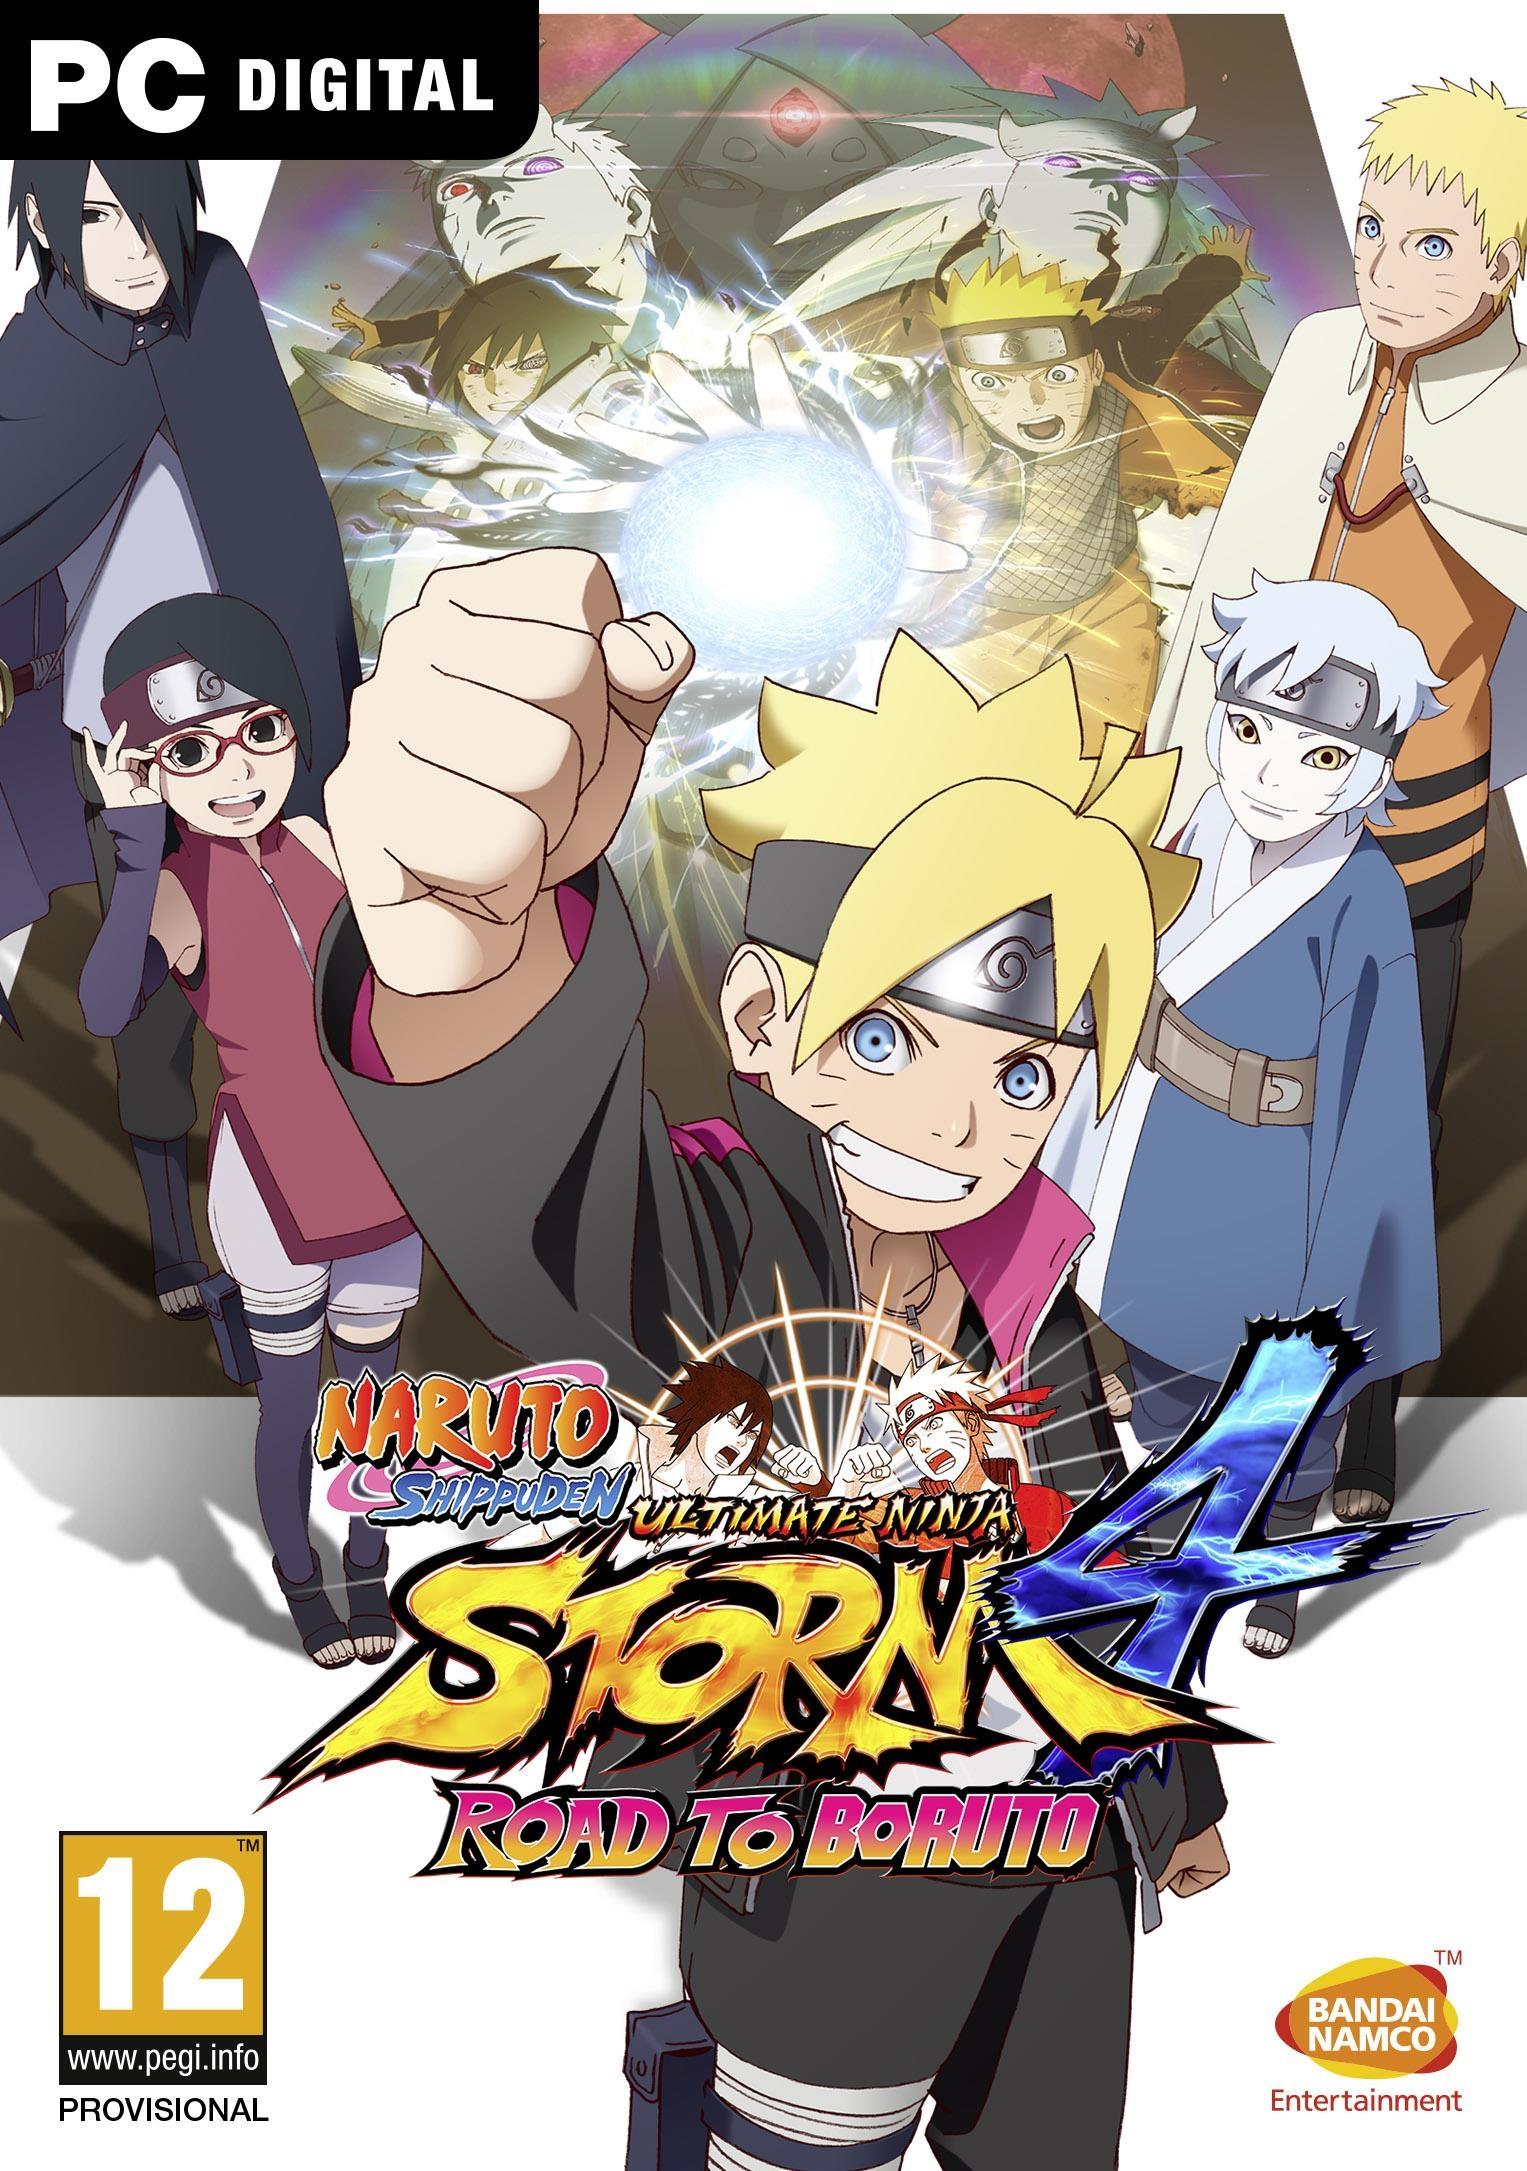 Naruto Shippuden Ultimate Ninja Storm 4 Road to Boruto DLC PC Descargar